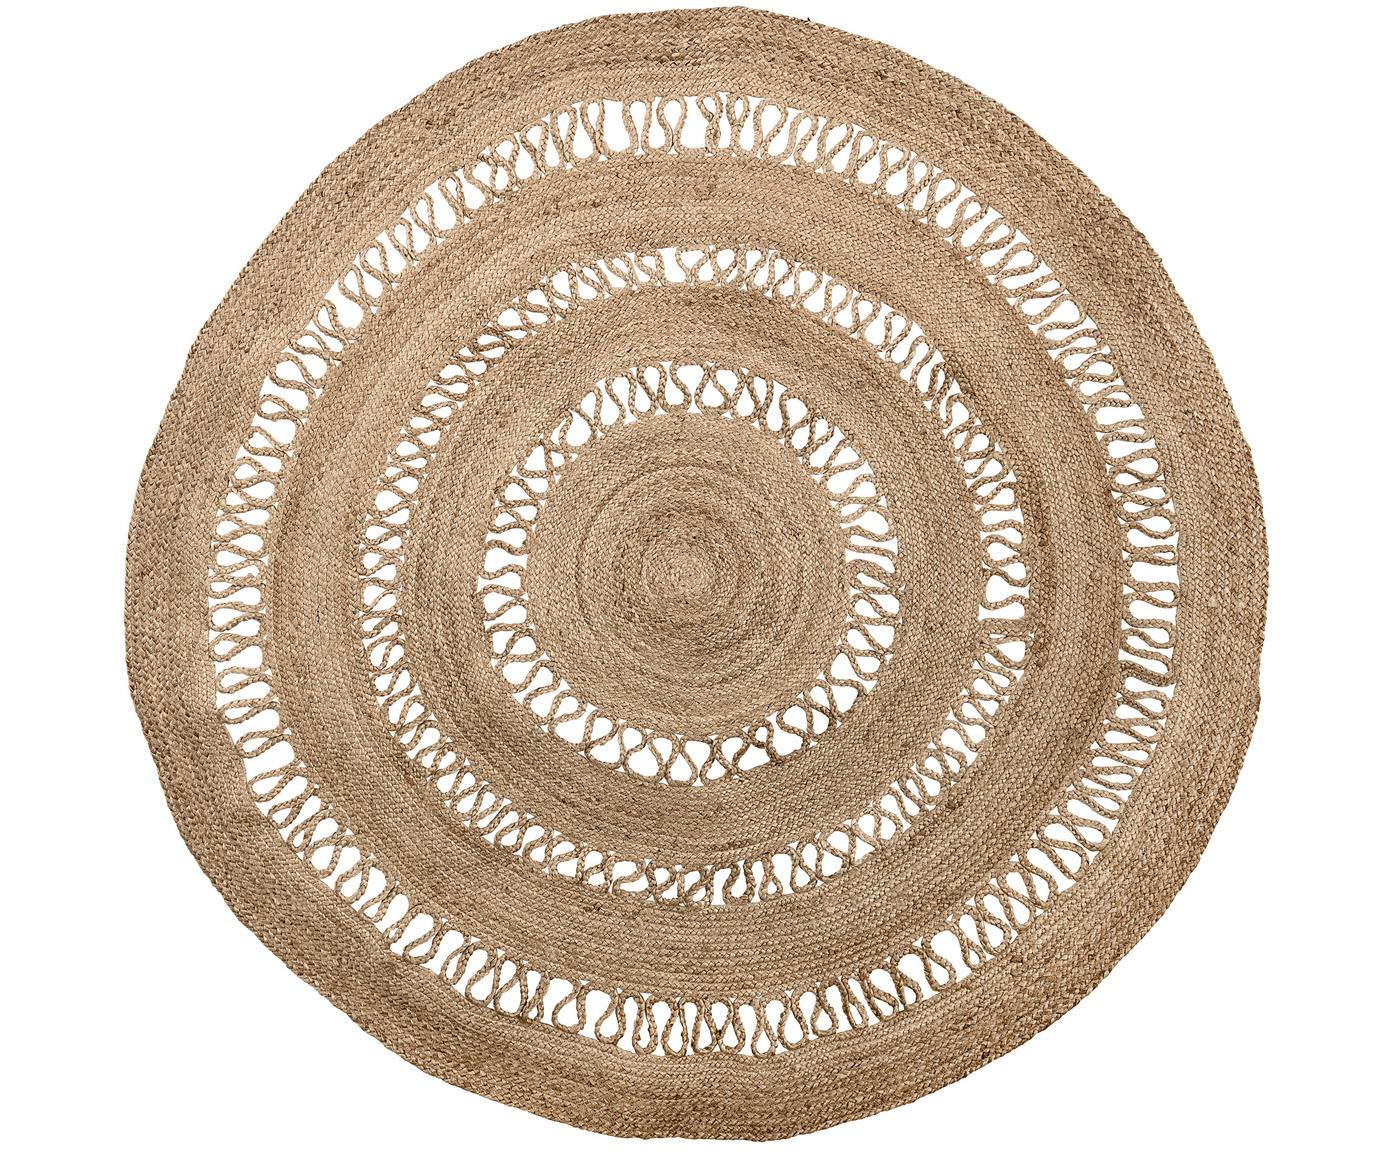 Runder Jute-Teppich Benita im Boho Style, Jute, Ø 182 cm (Grösse L)